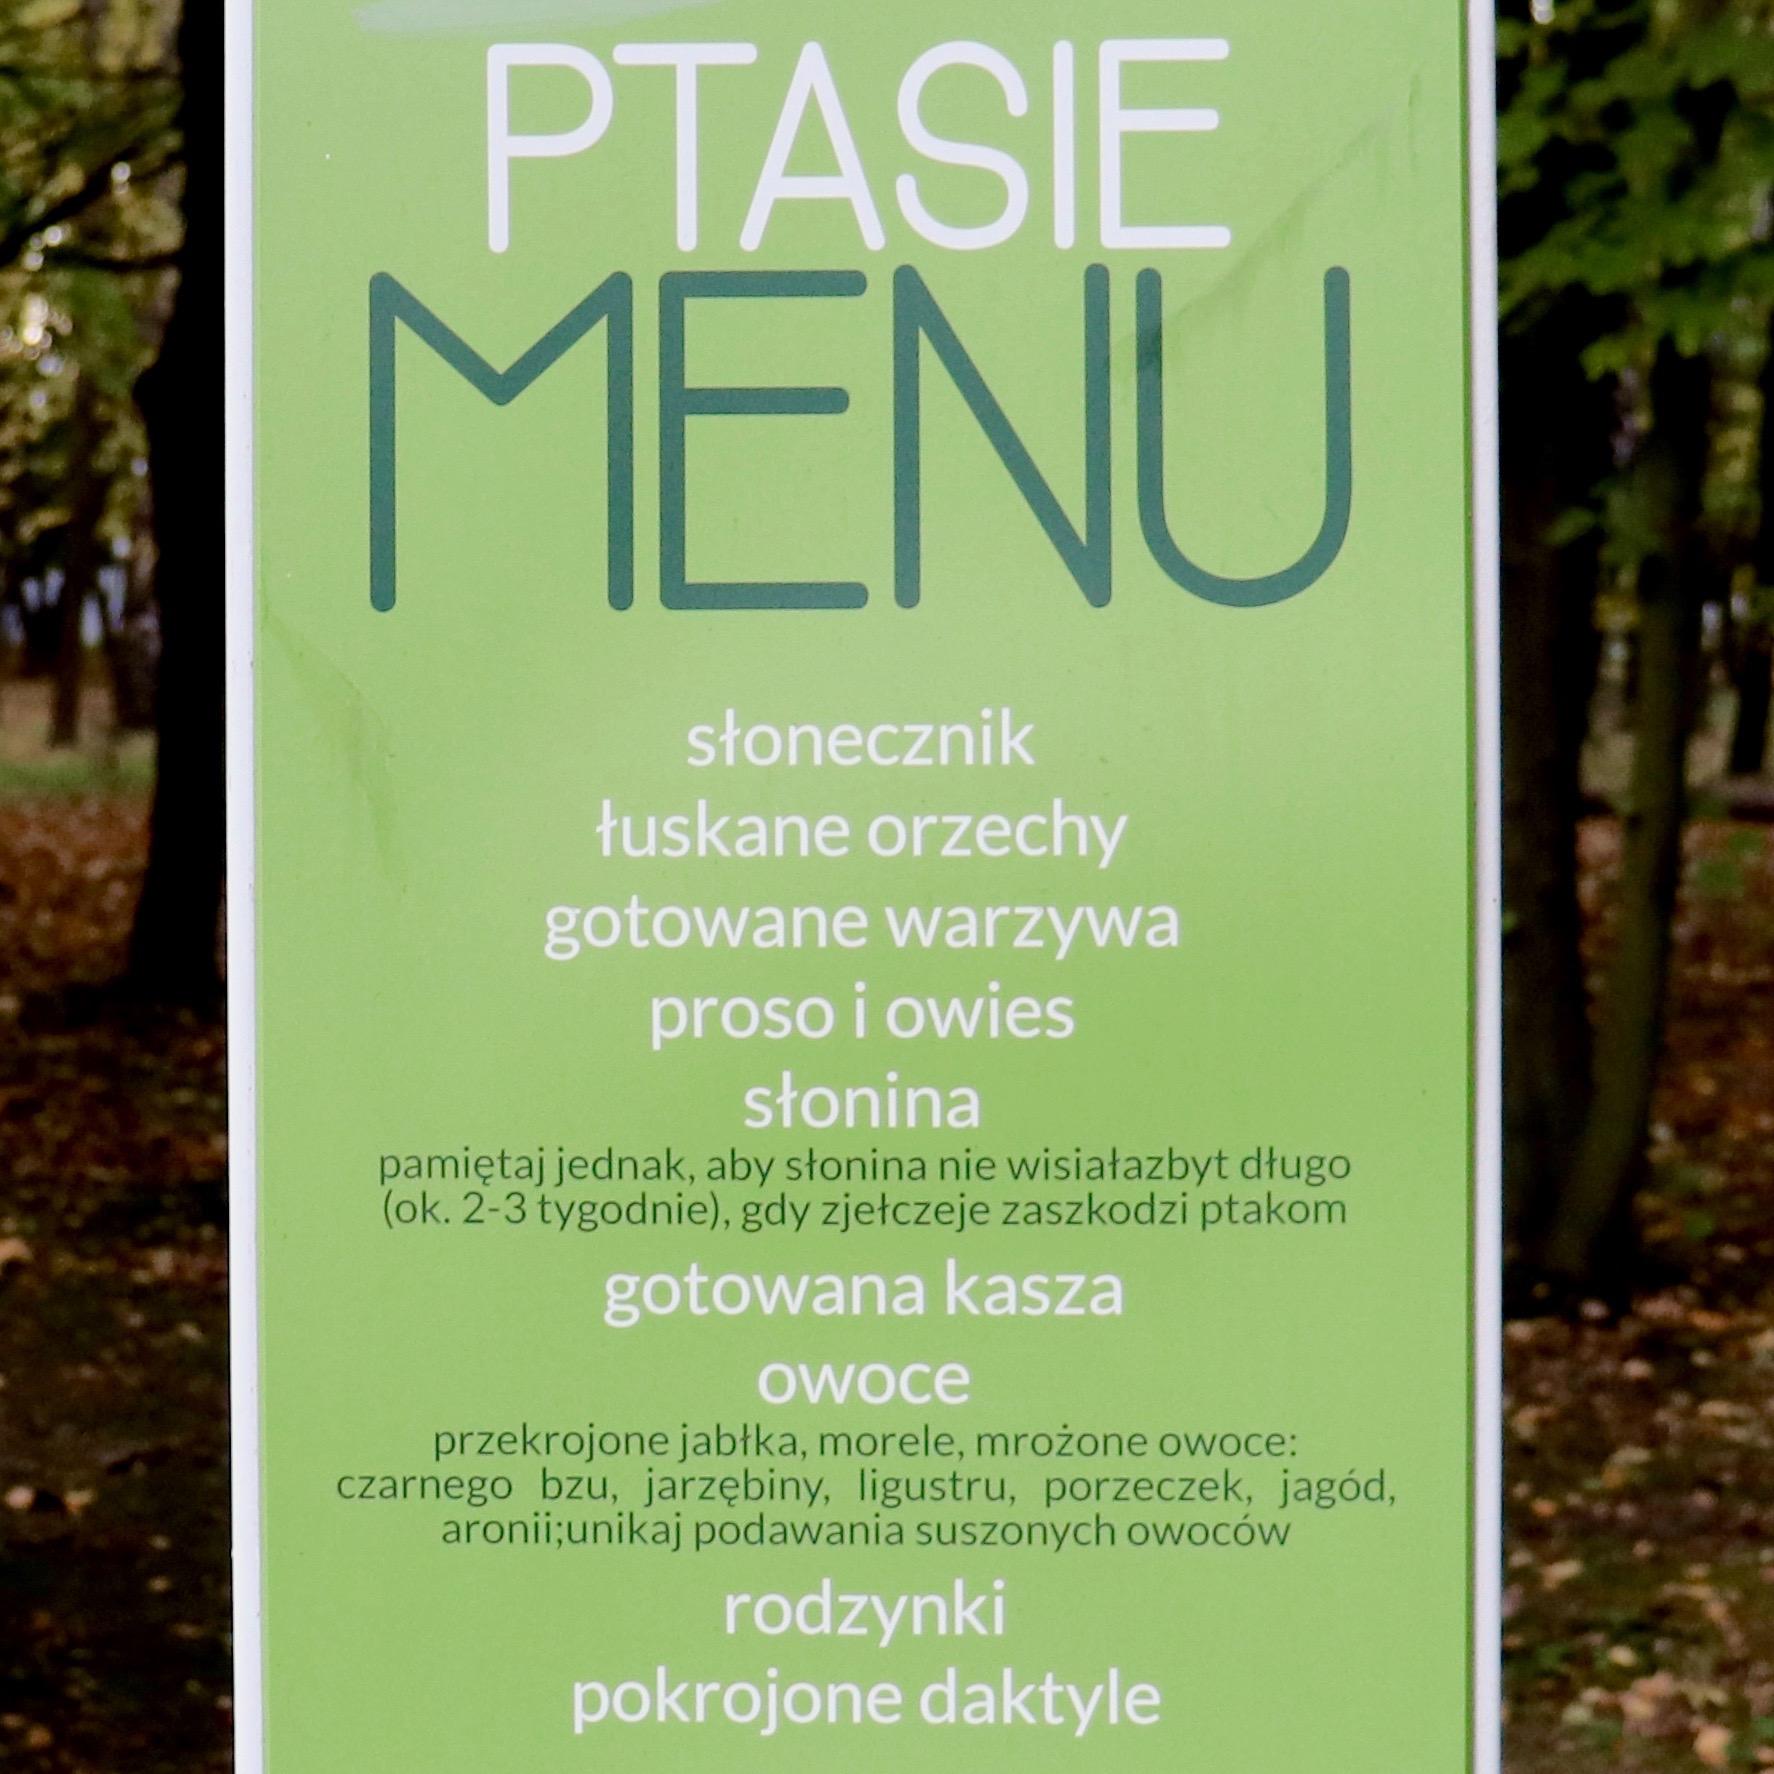 ptasie menu